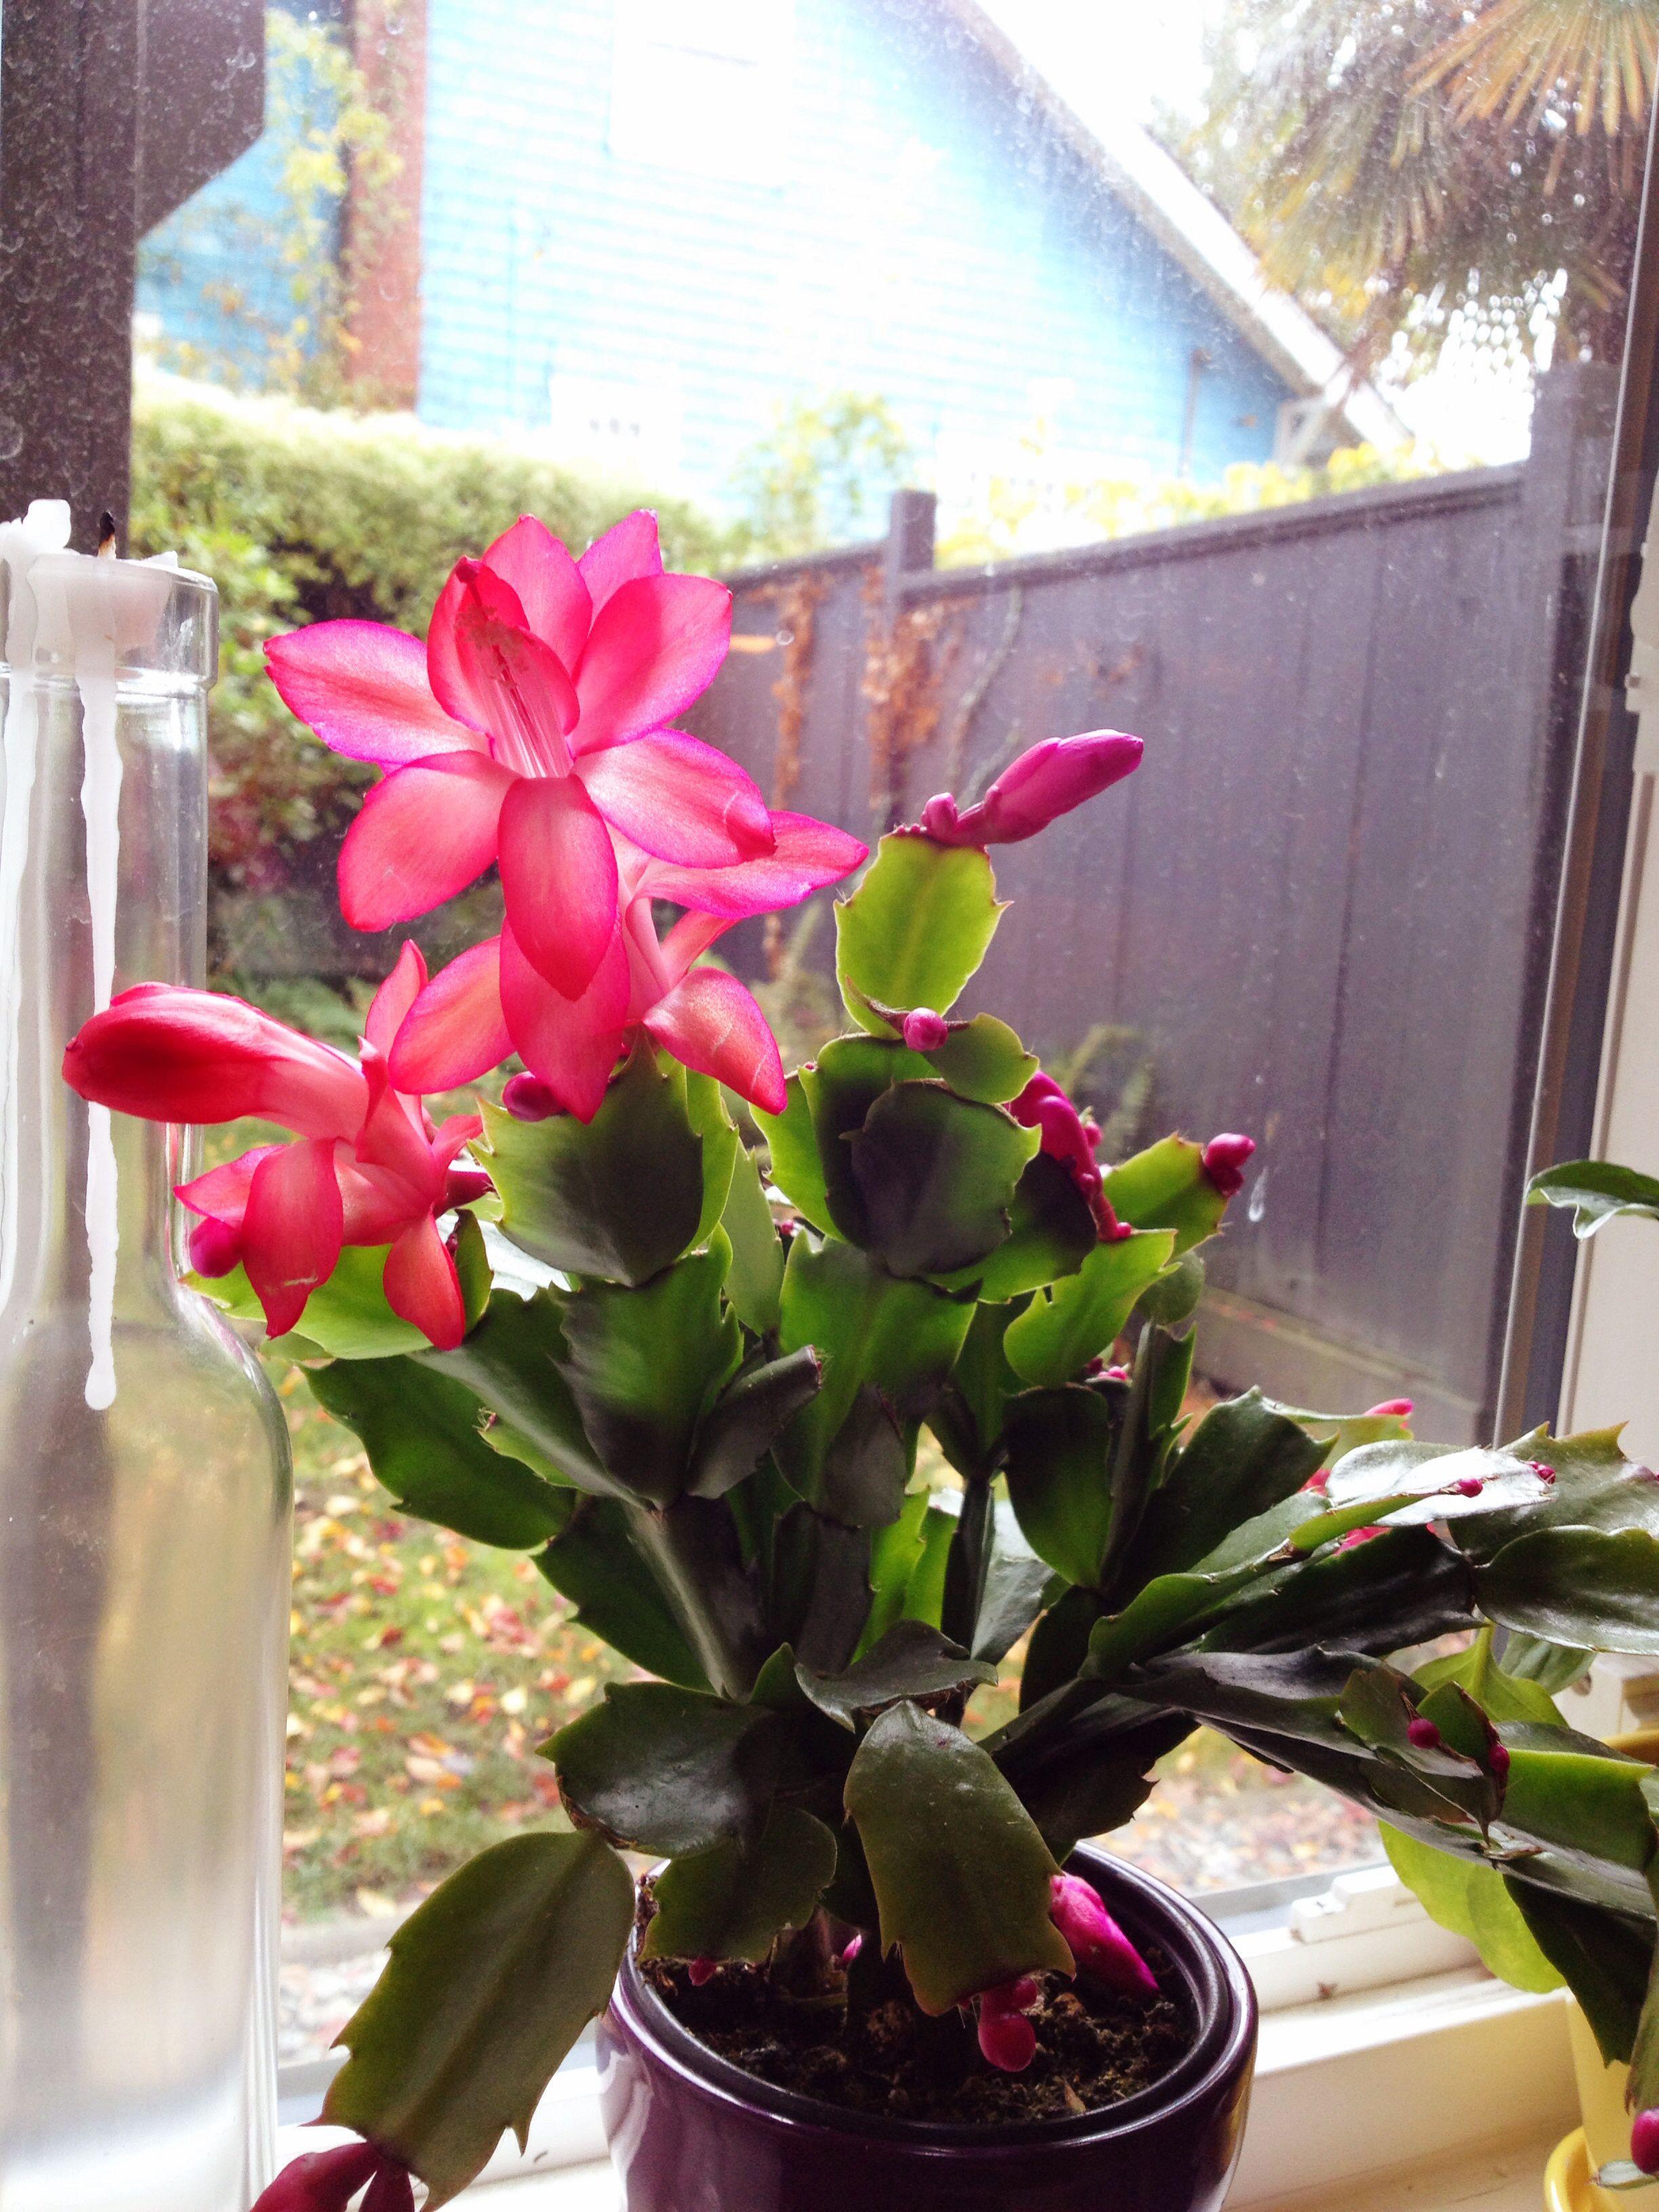 christmas cactus in bloom plants pinterest. Black Bedroom Furniture Sets. Home Design Ideas